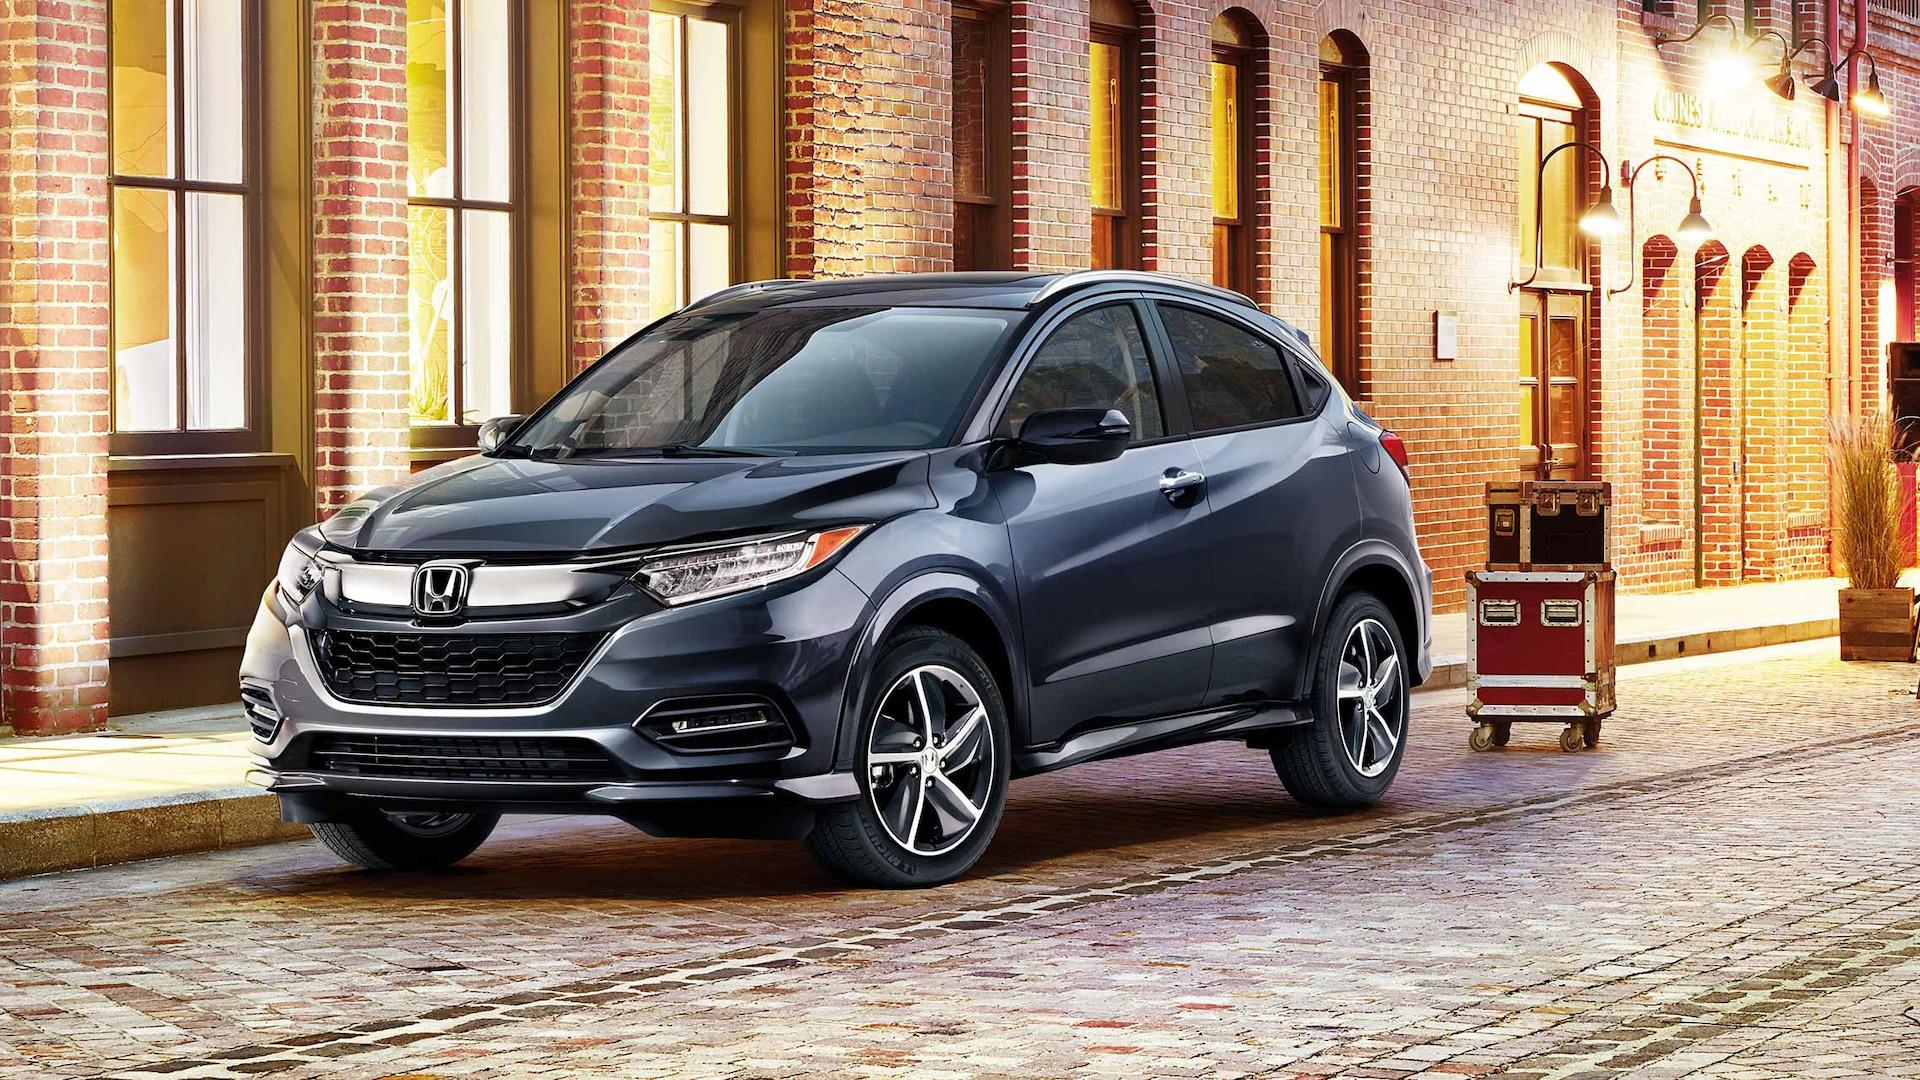 2020 Honda HR-V Front Black Exterior